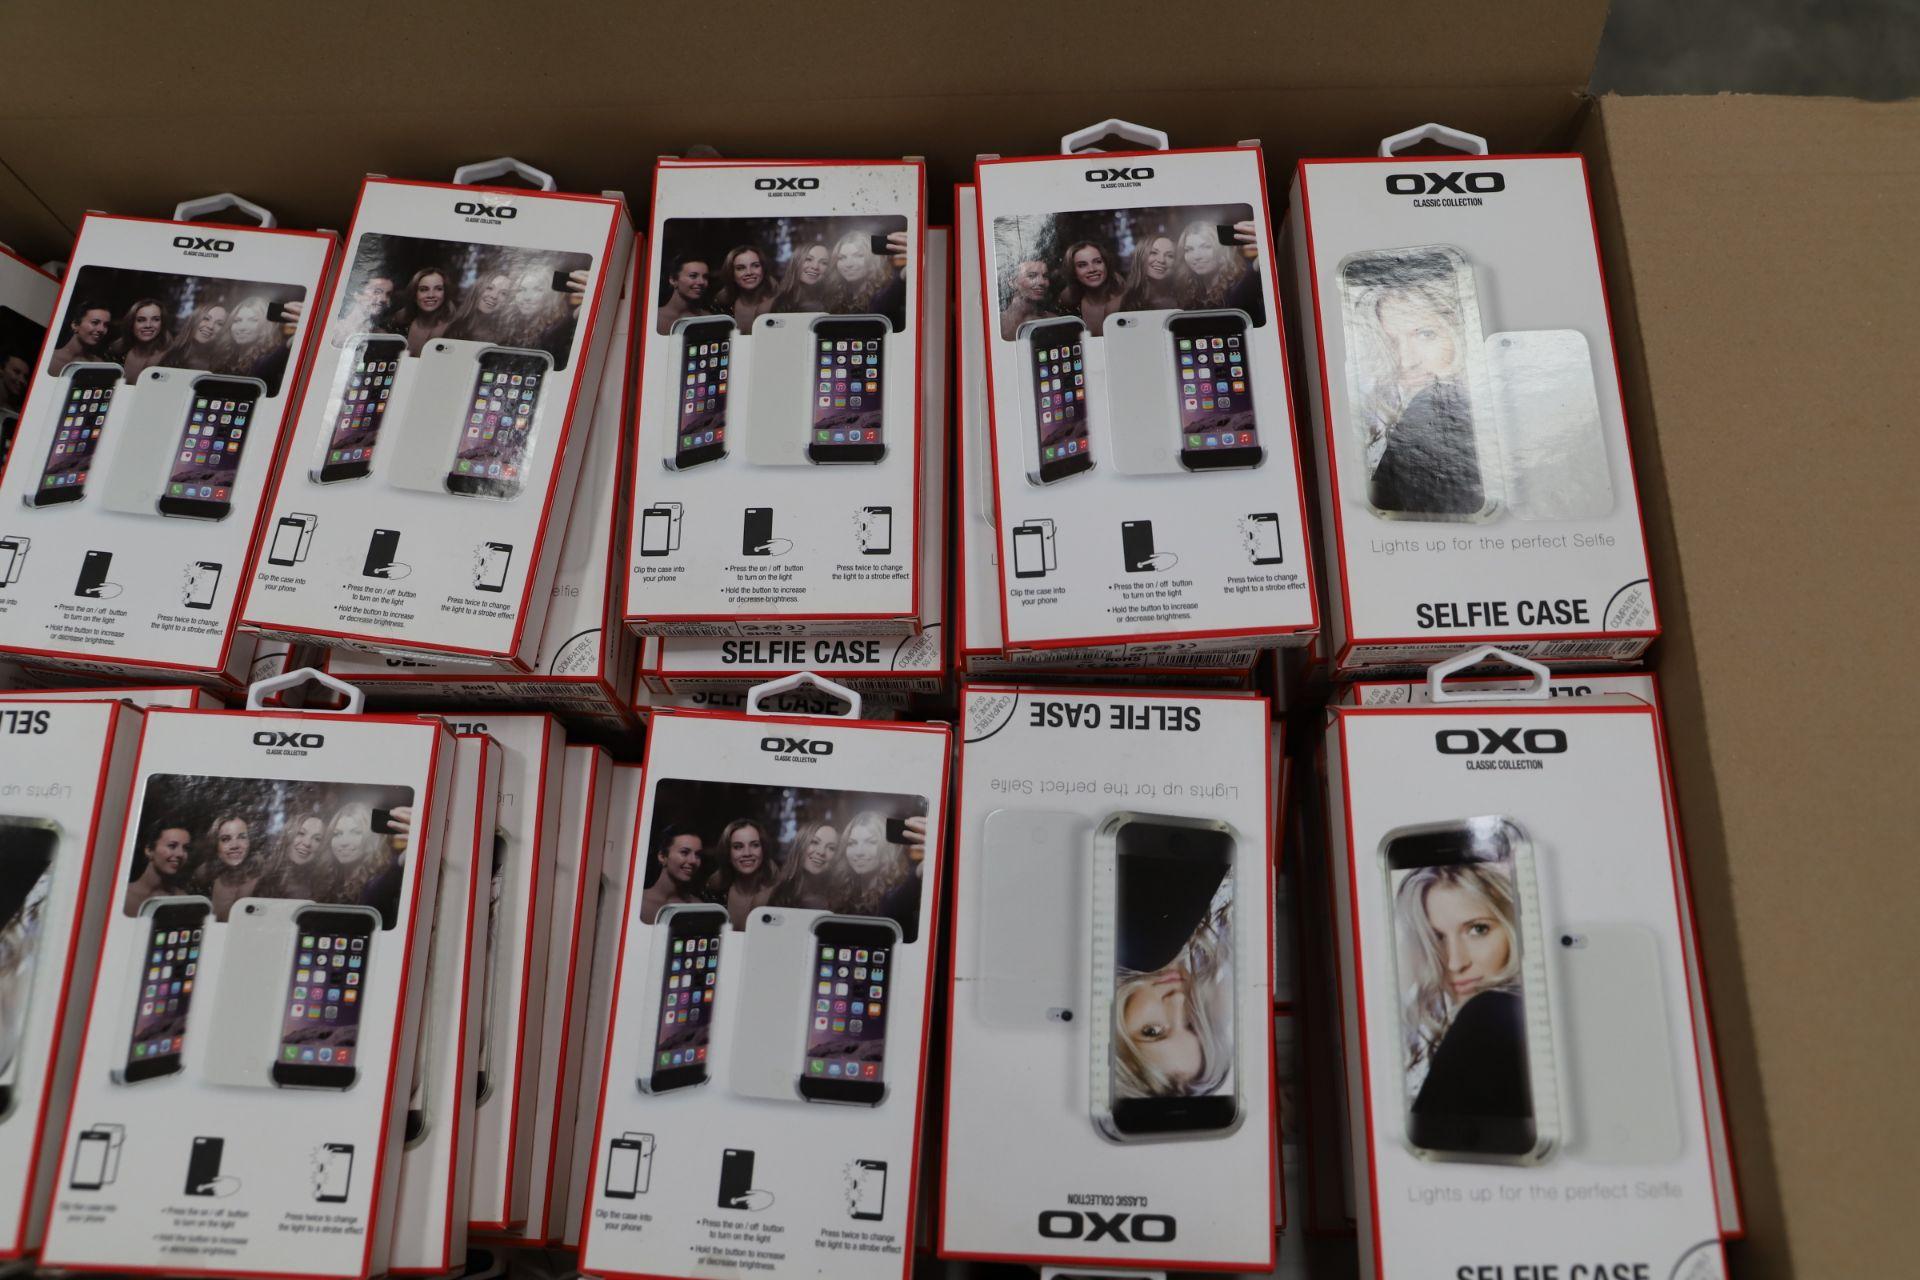 Lot 14 - *No Reserve* 184 LEDlightup selfie case for Iphone, RRP £2760.00